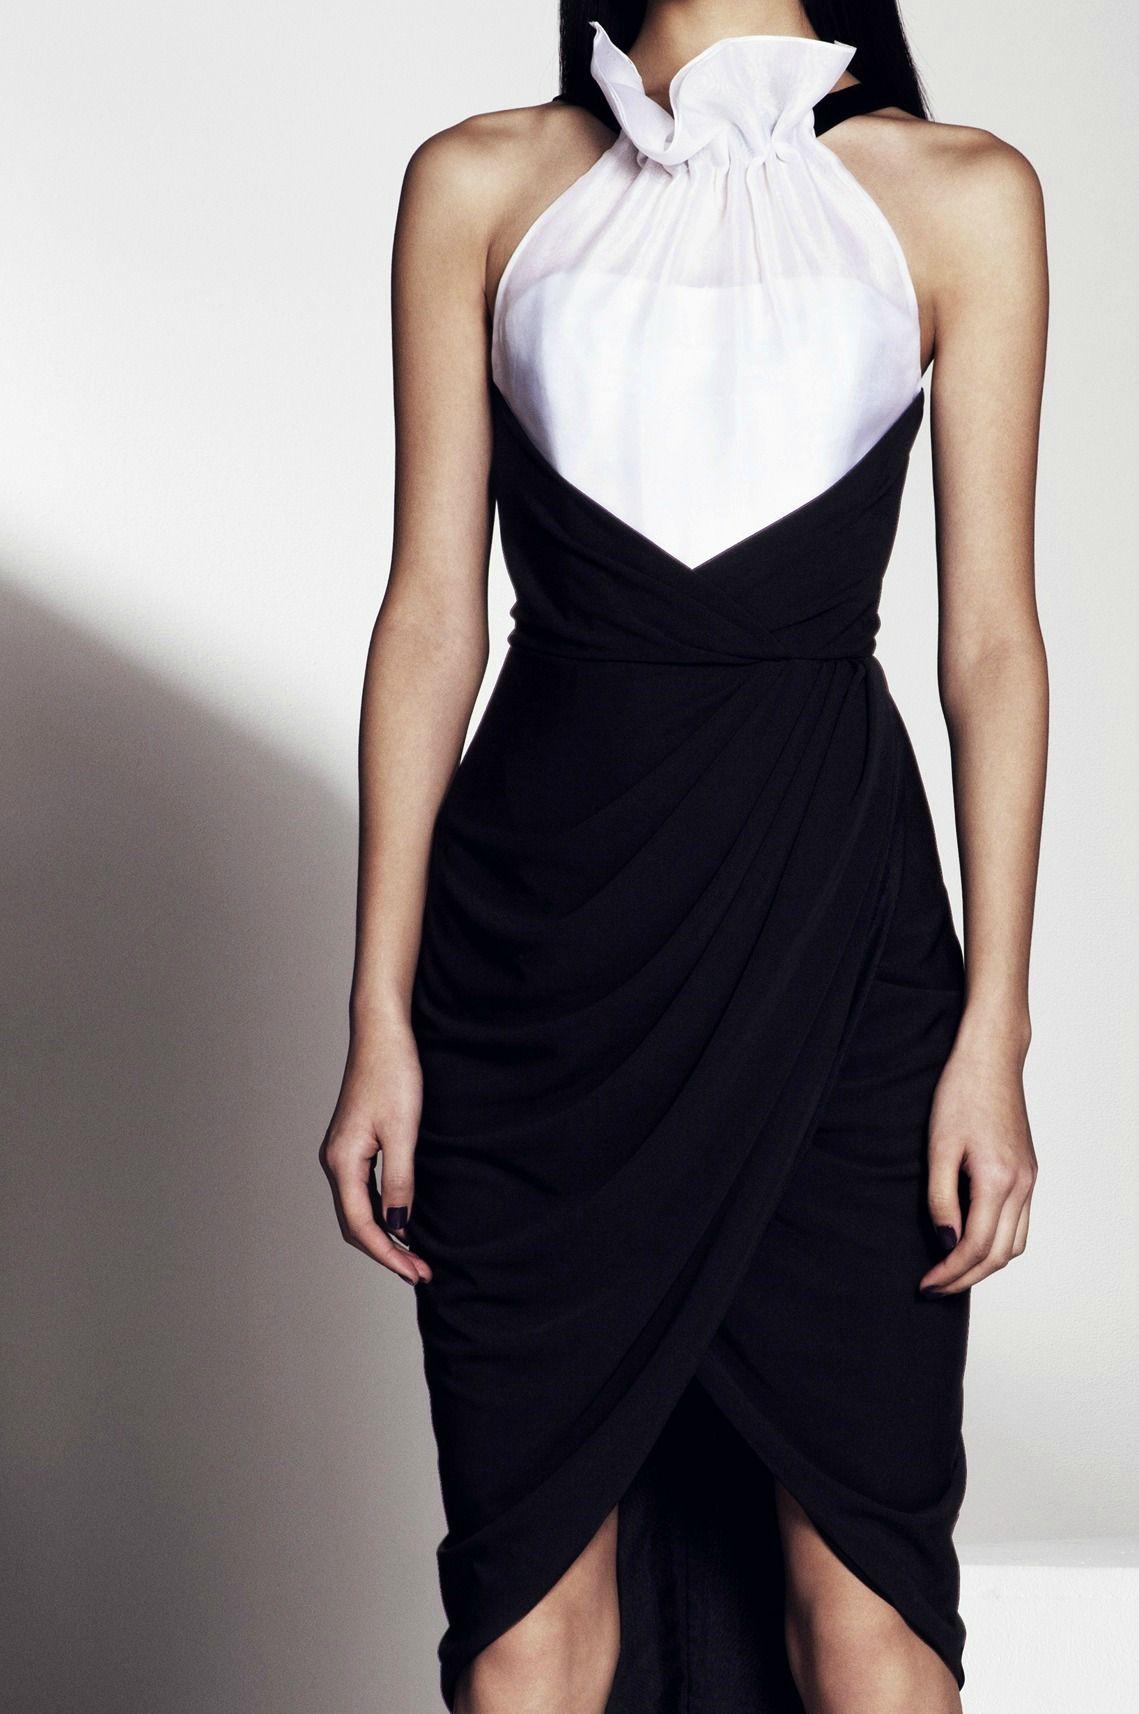 Black u white dres by prabal gurung i havenut quite seen a dress